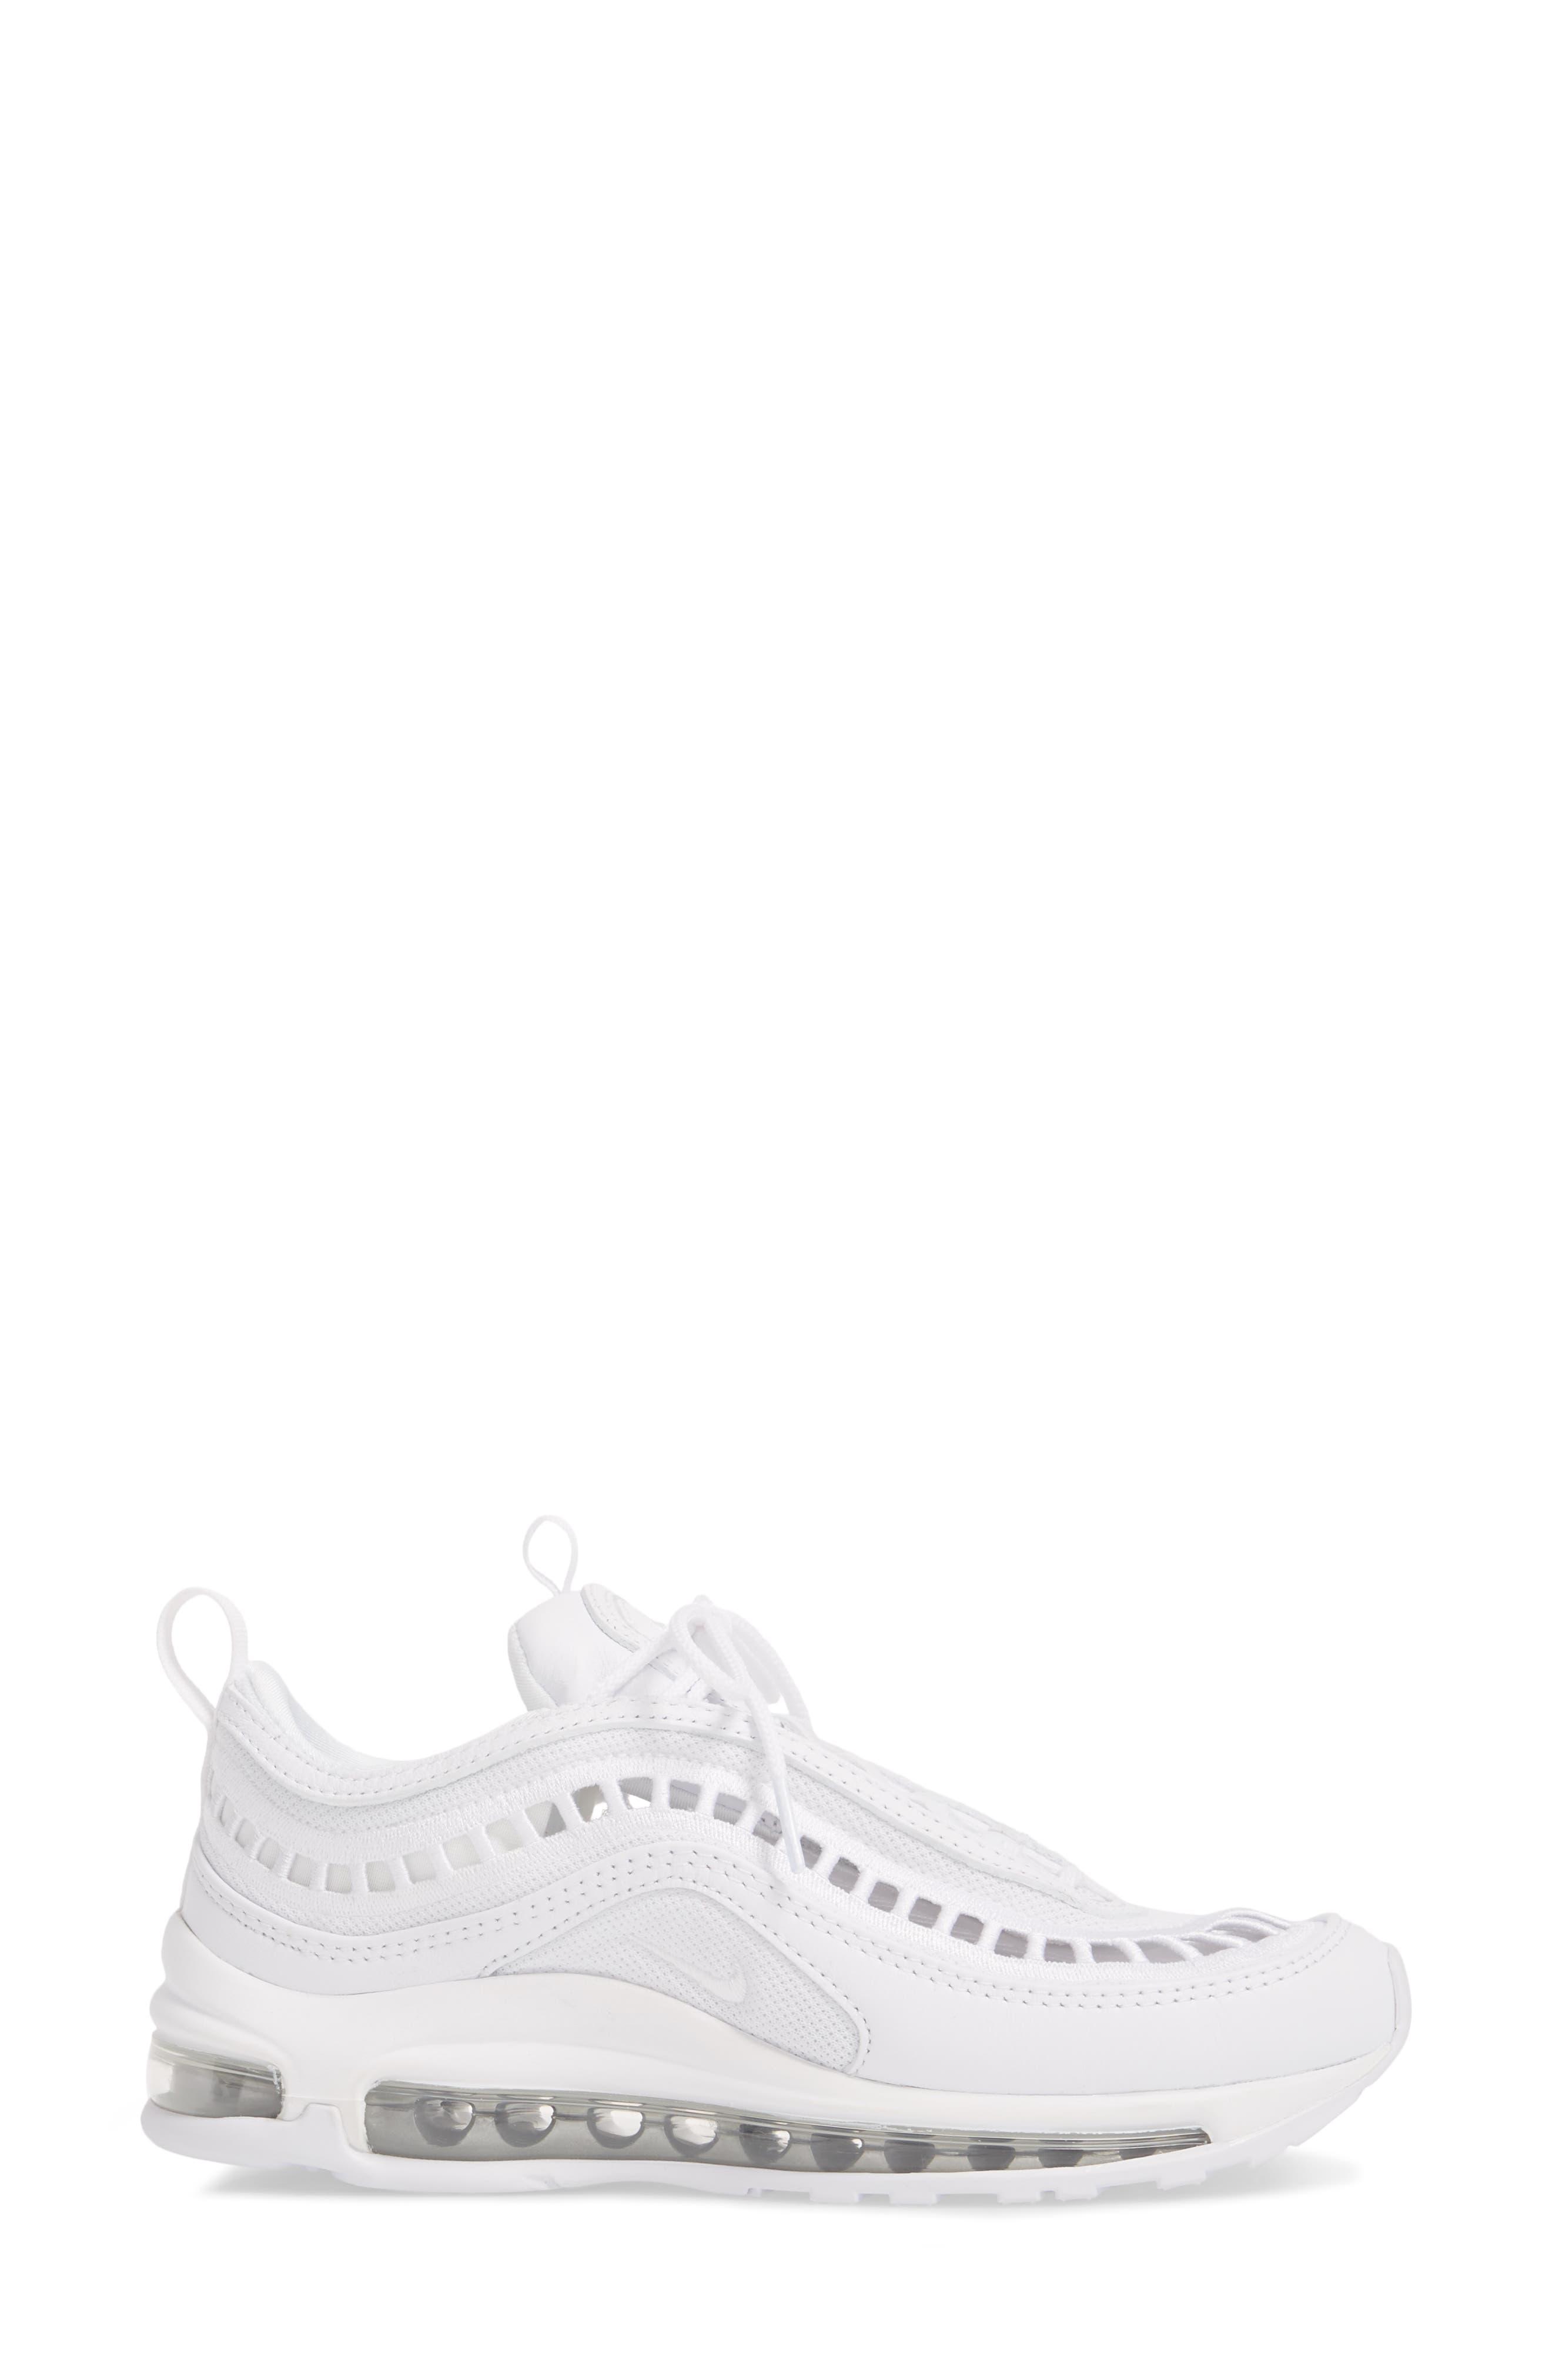 Air Max 97 Ultra '17 SI Sneaker,                             Alternate thumbnail 3, color,                             WHITE/ WHITE/ VAST GREY